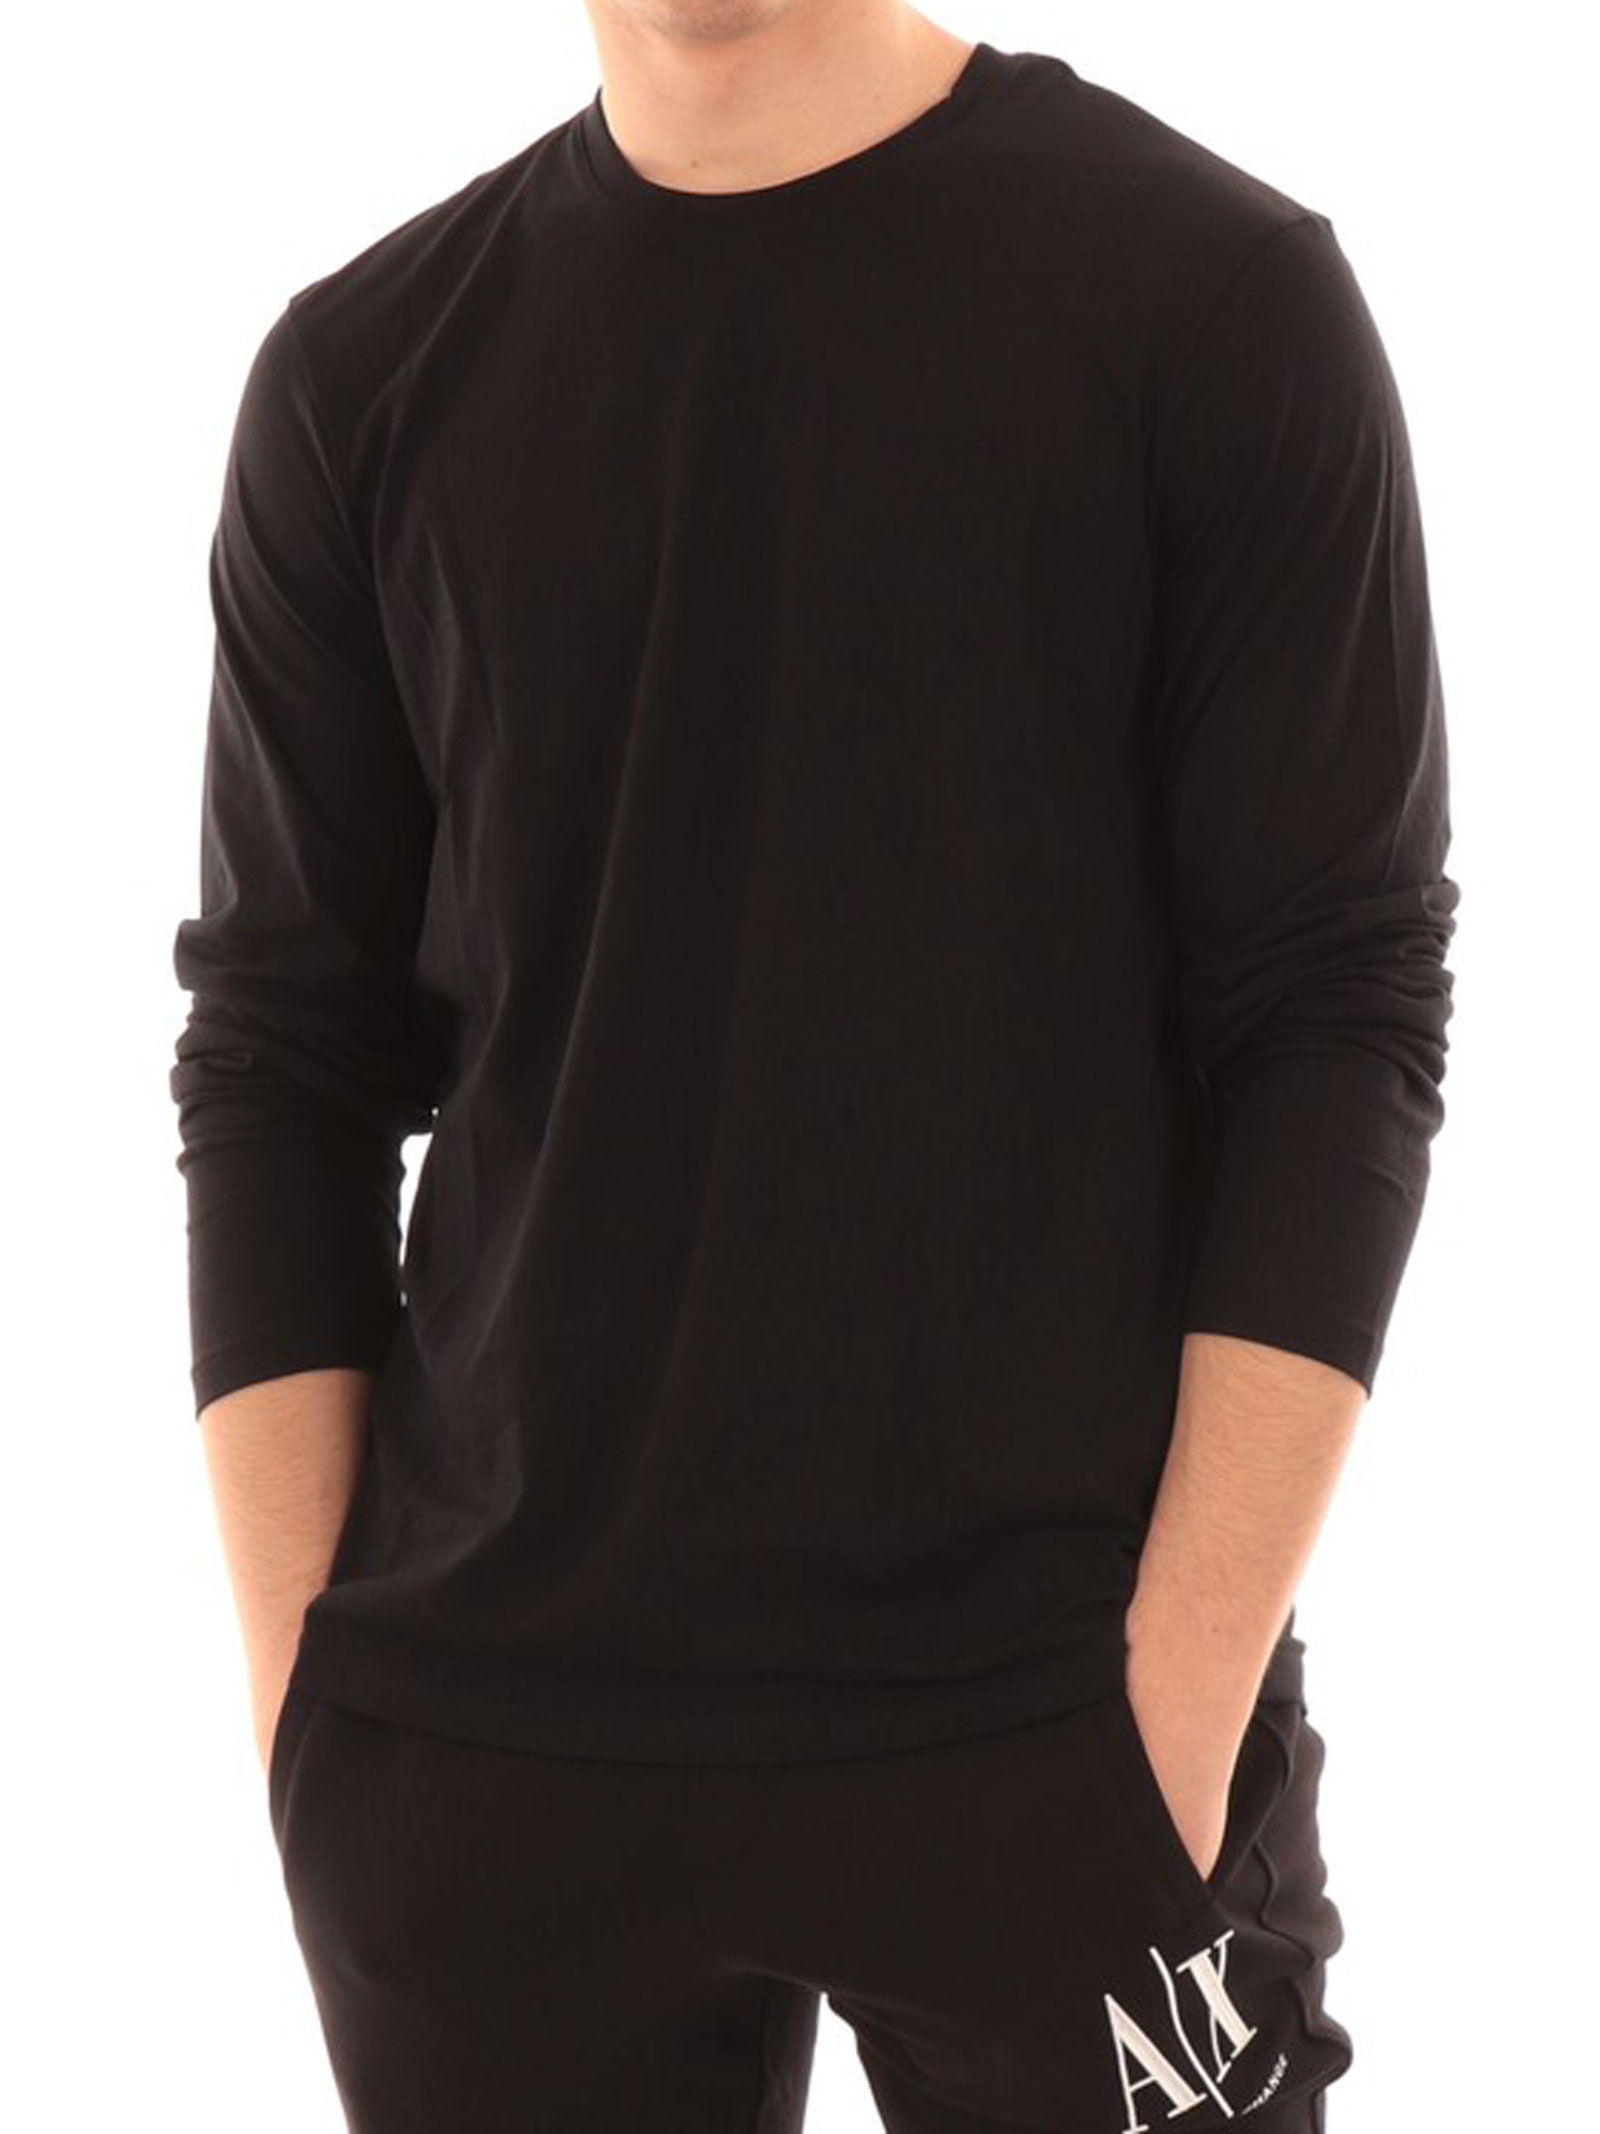 MAGLIA ARMANI EXCHANGE ARMANI EXCHANGE   T-shirt   8NZM77-ZJA5Z1200